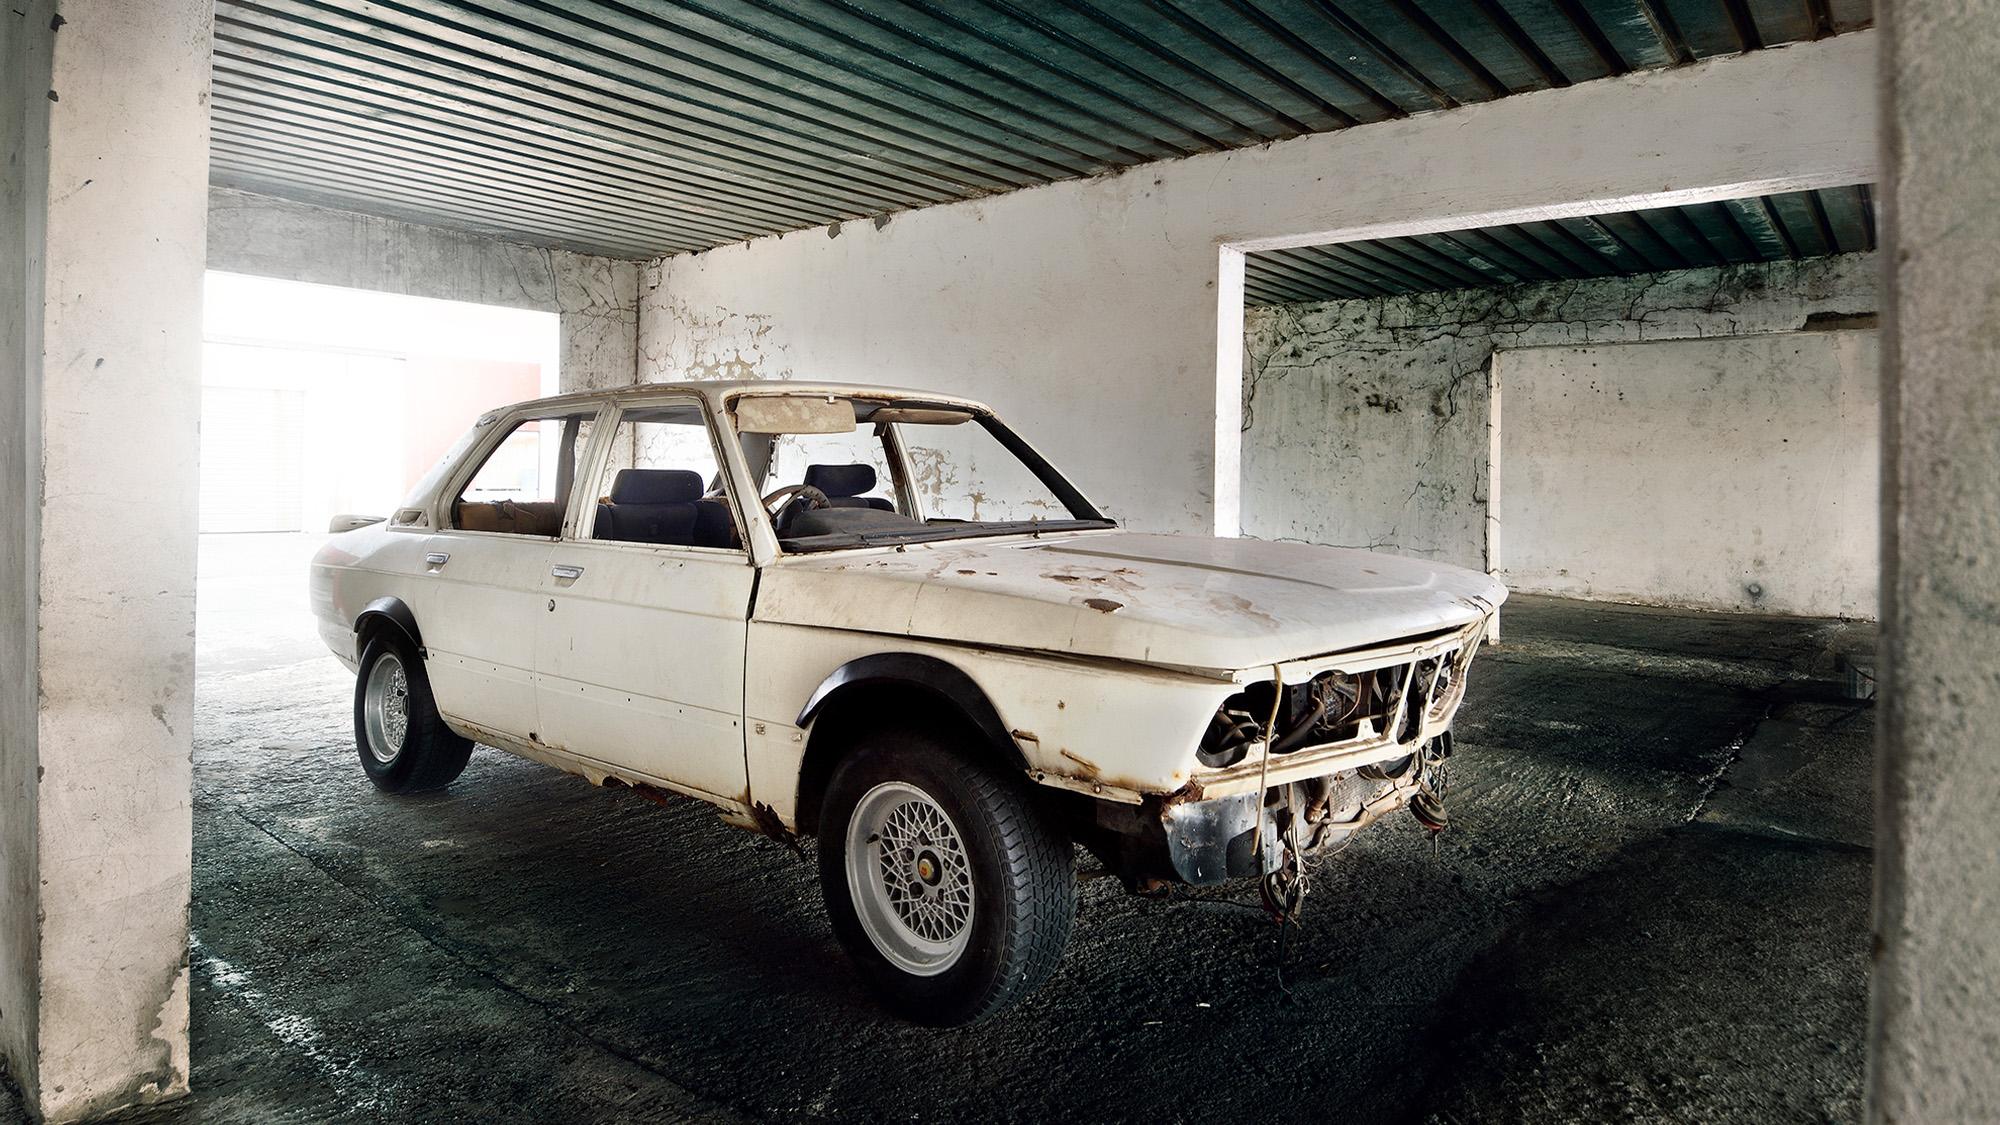 BMW 530 MLE pre restoration